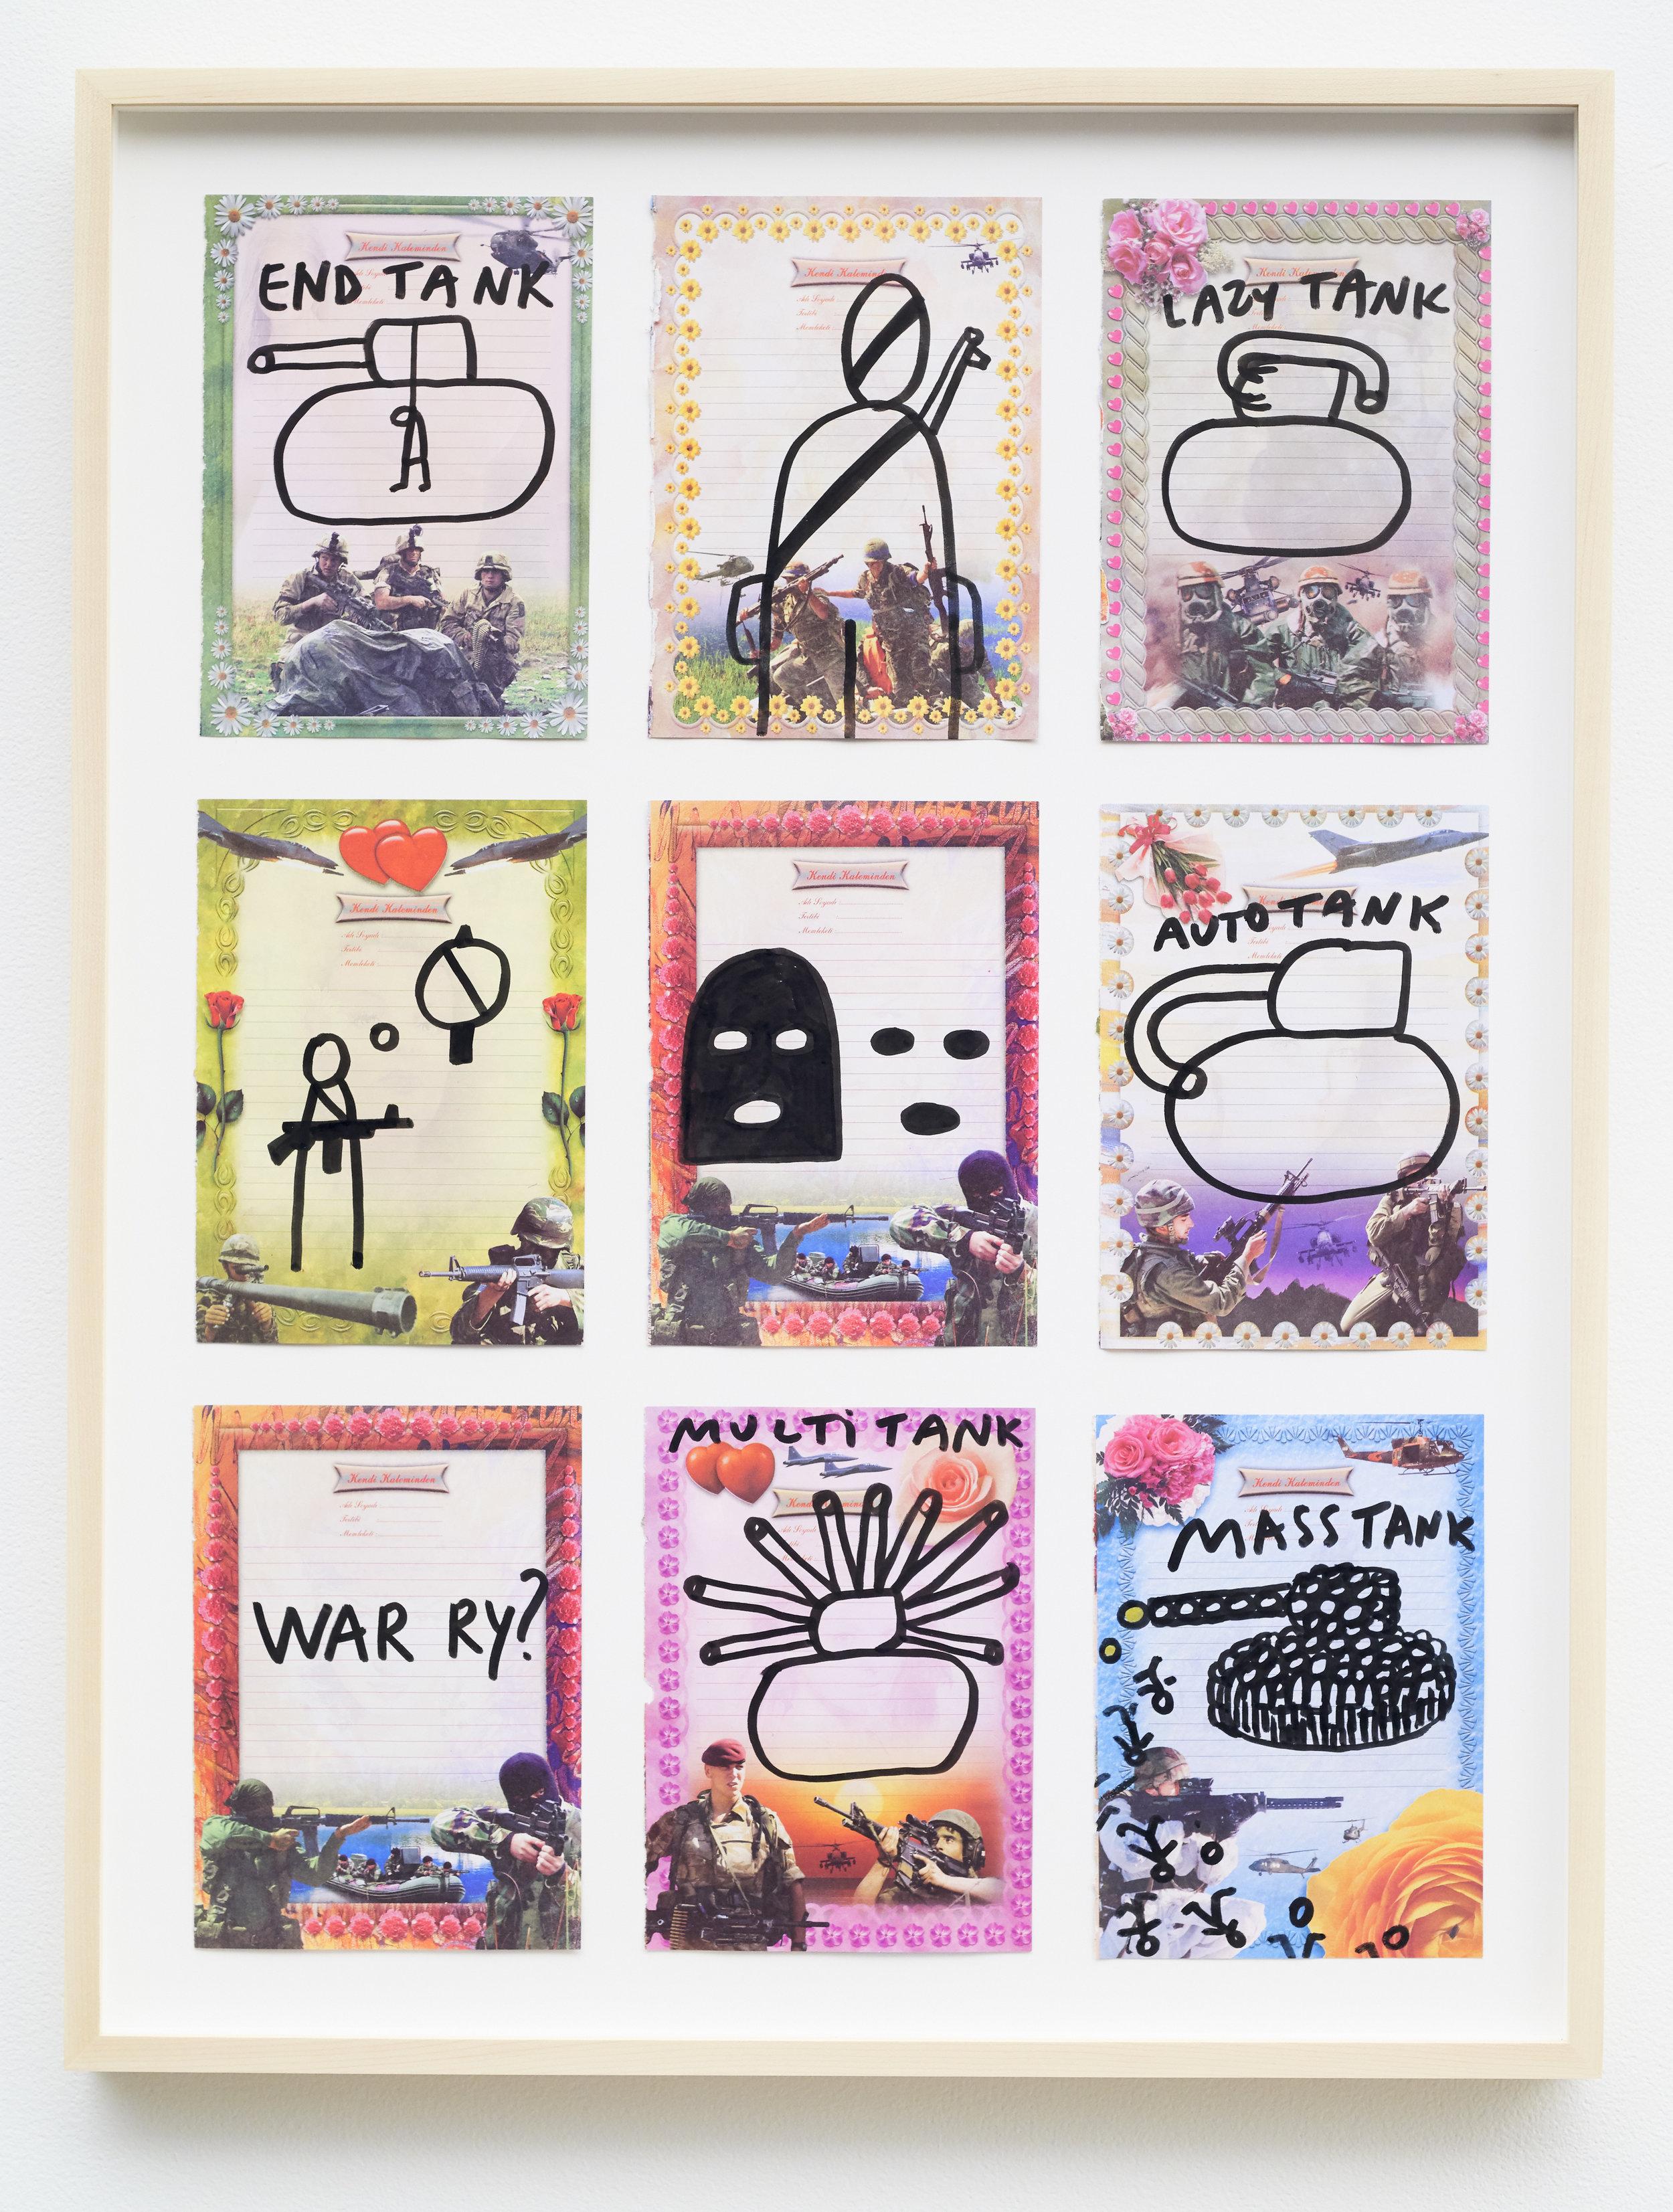 Dan Perjovschi   War ry , 2017 ink on paper 27 x 20.5 inches 68.6 x 52.1 cm